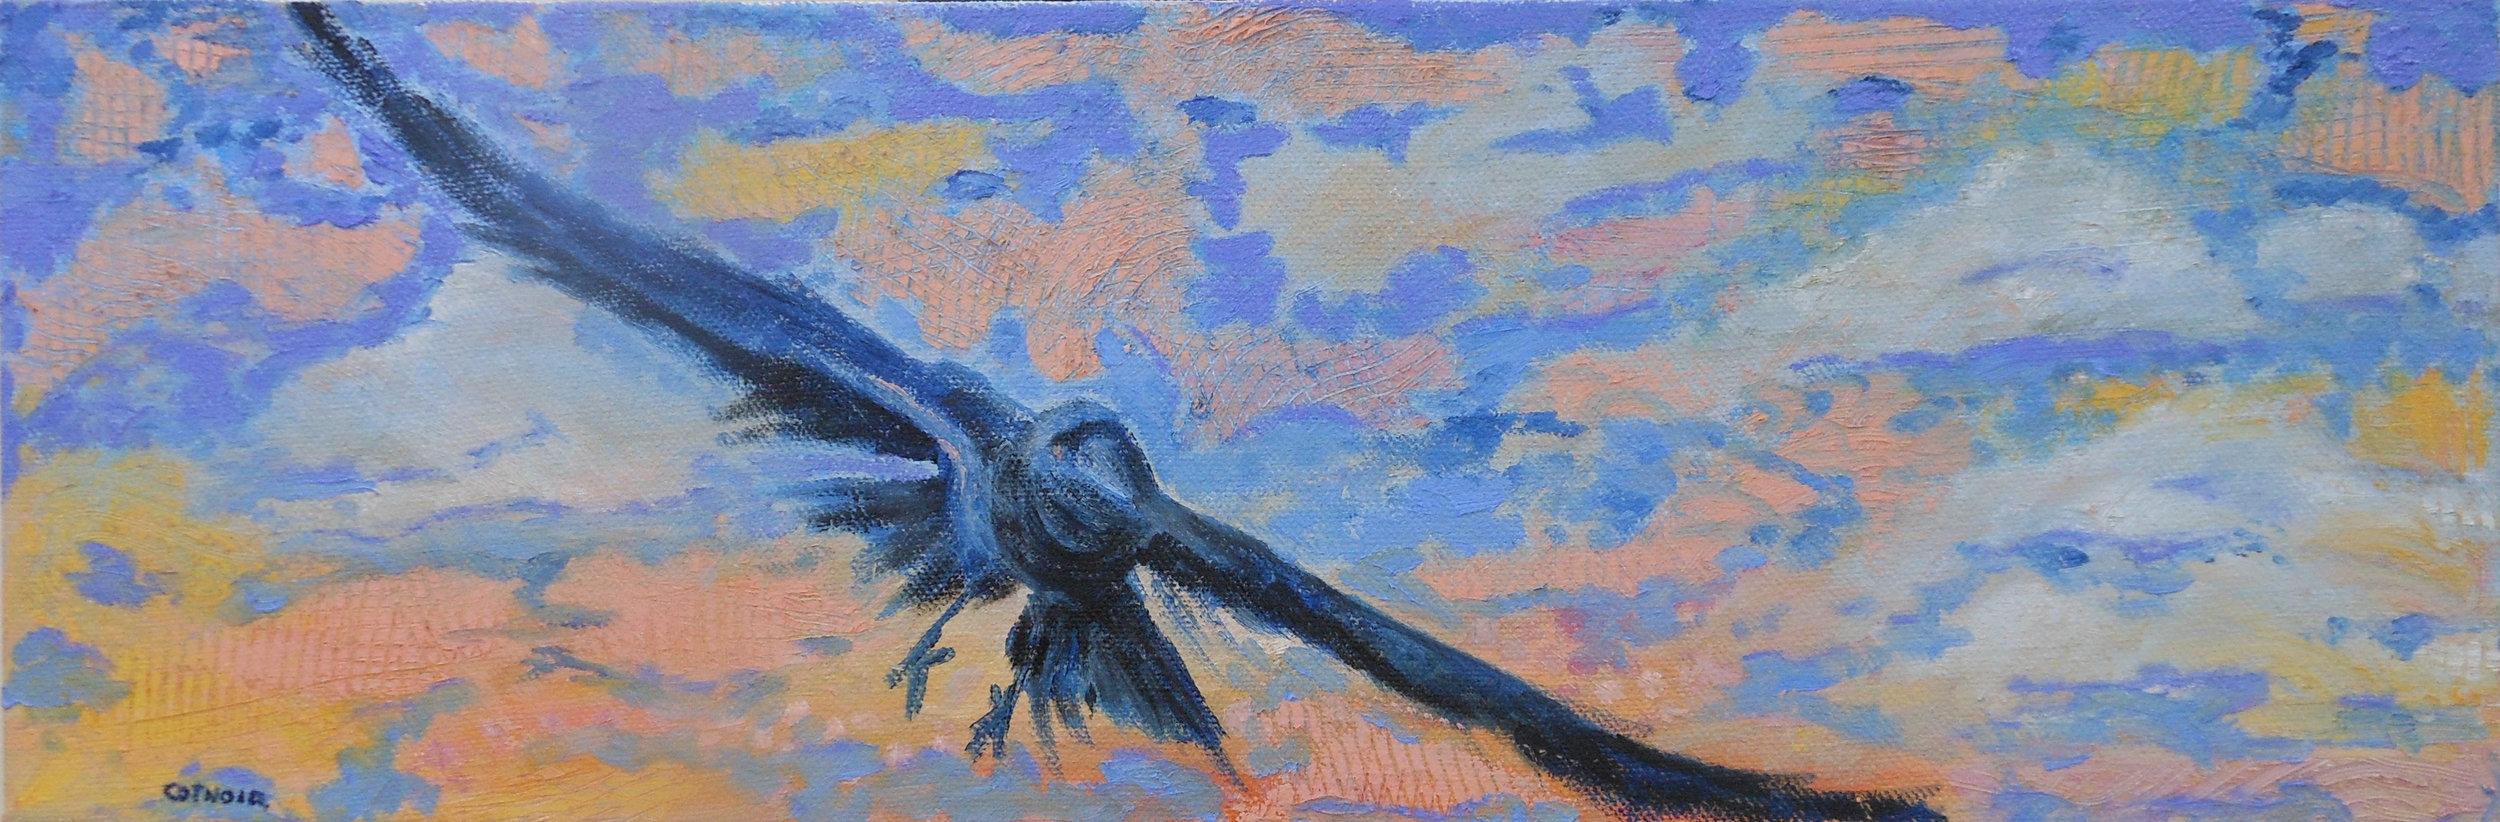 As the Crow Flies #3